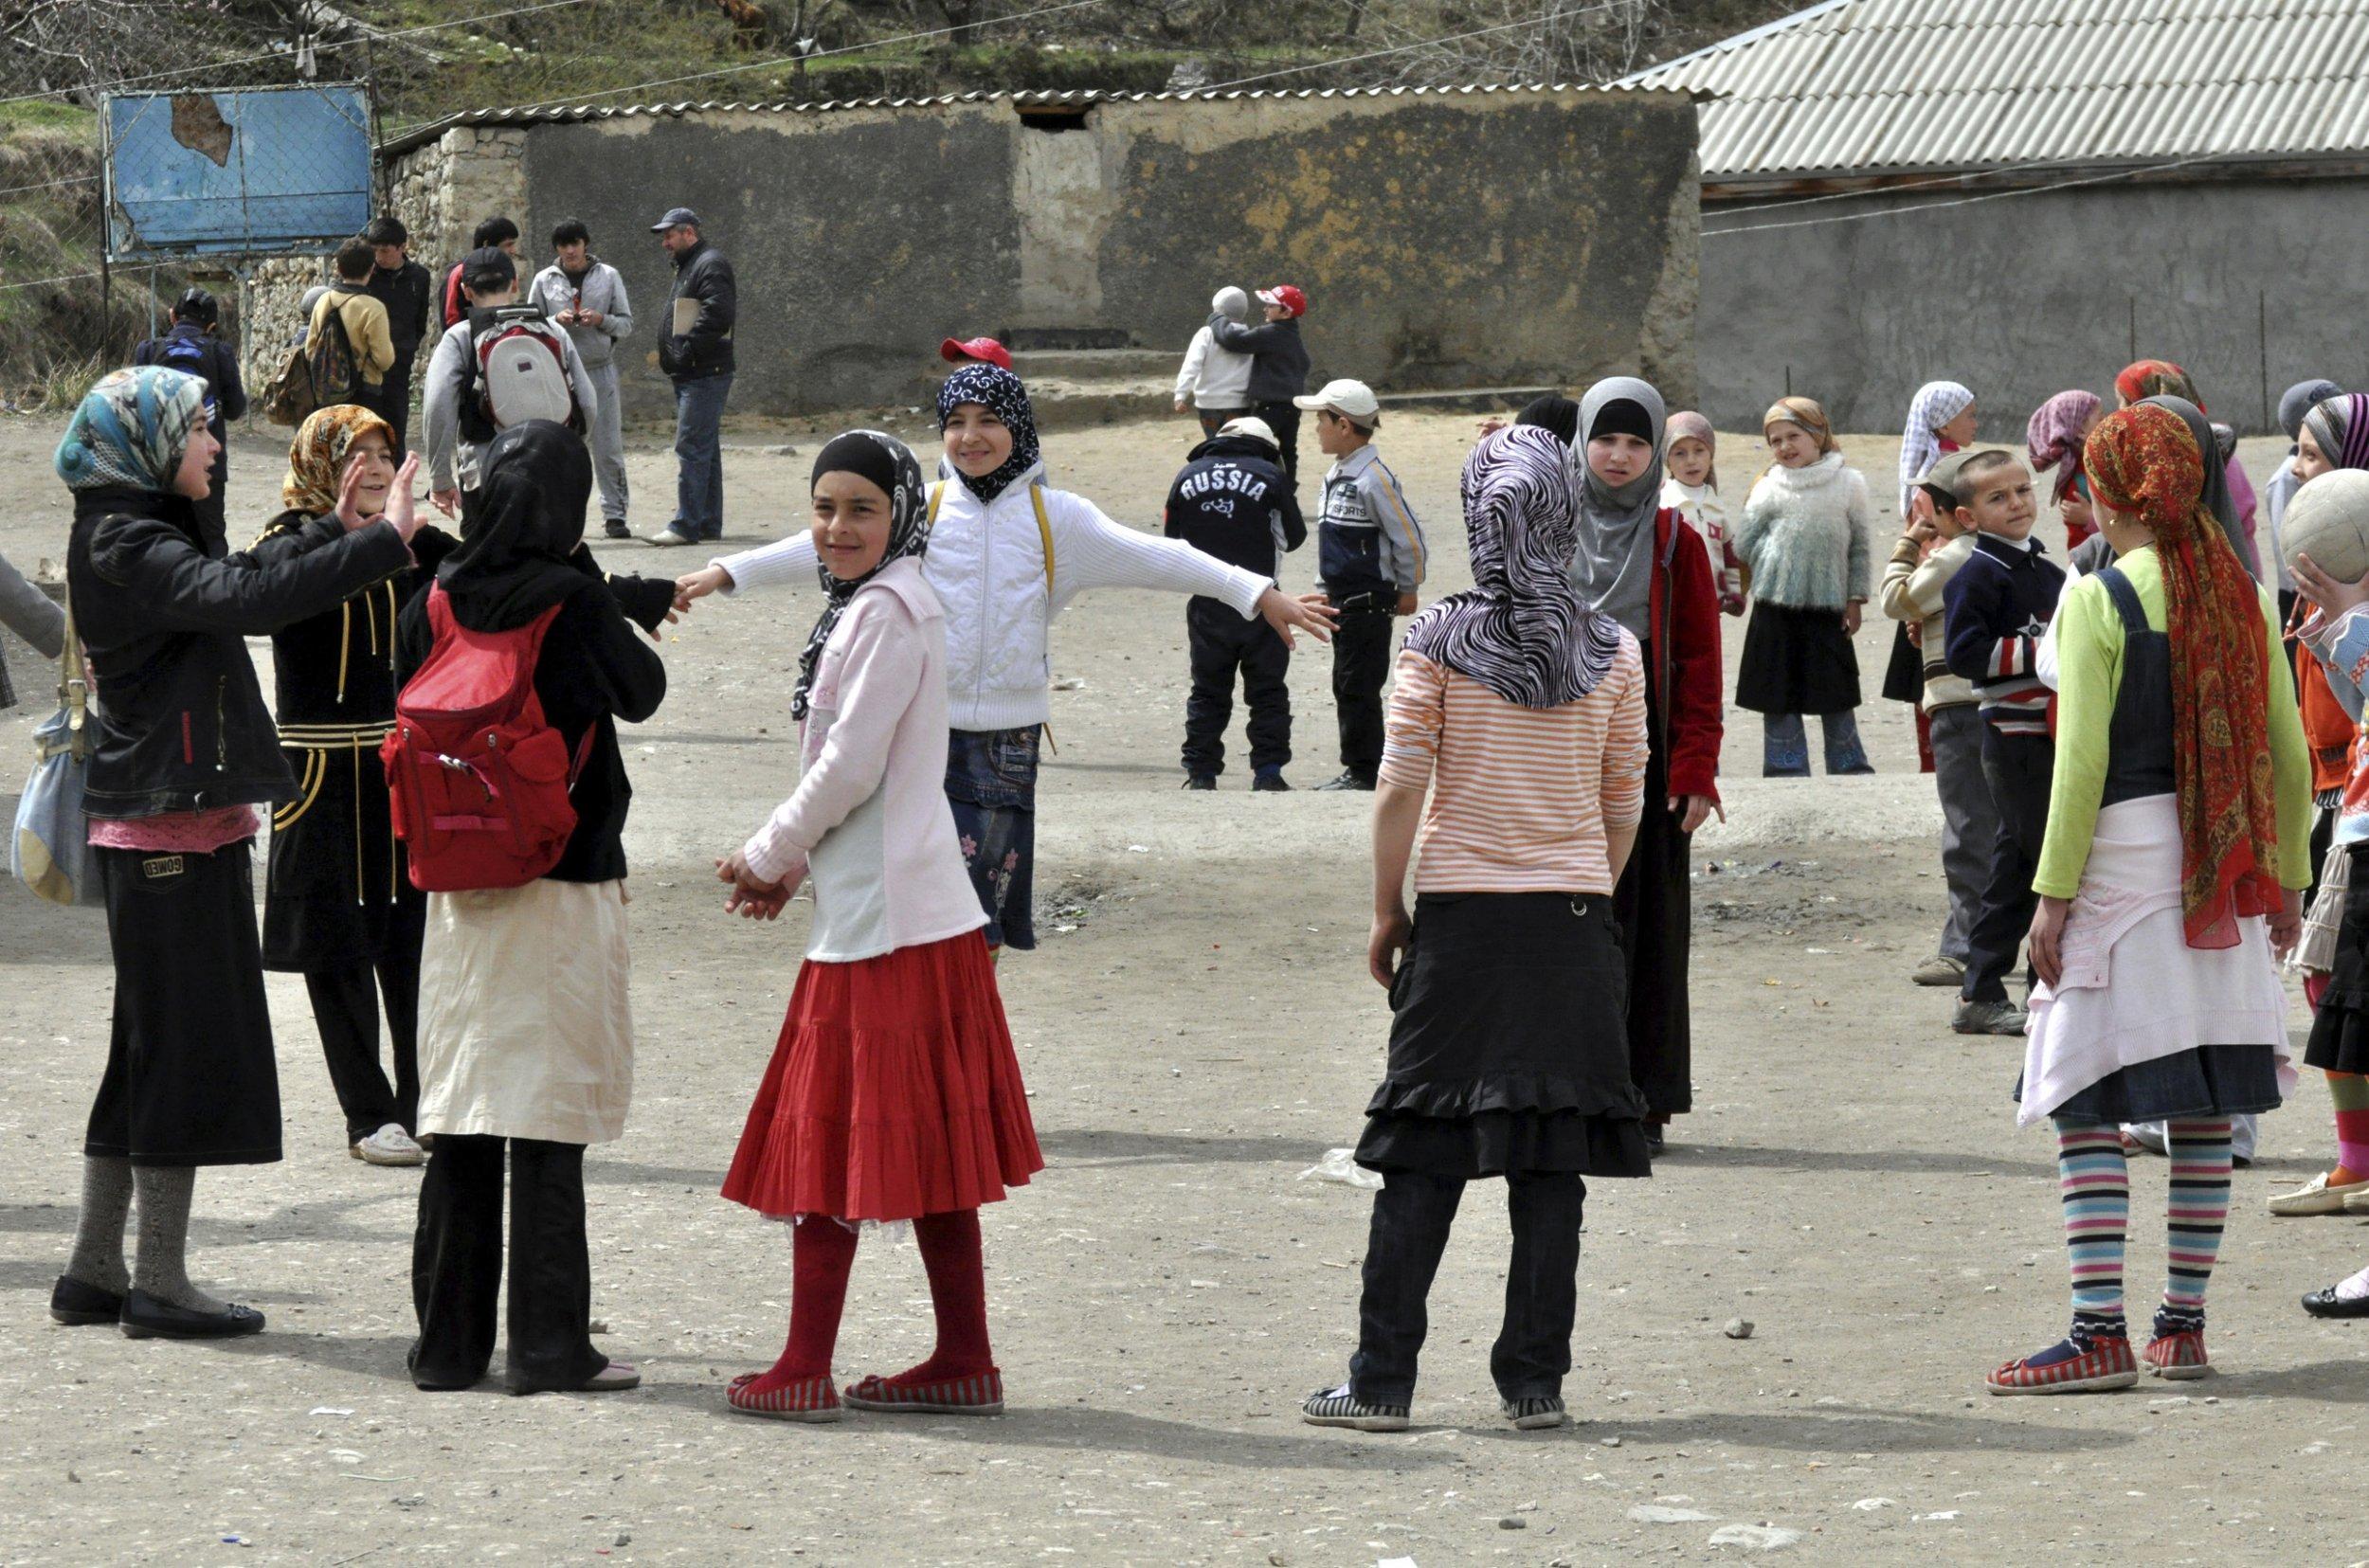 fgm_dagestan_russia_0817